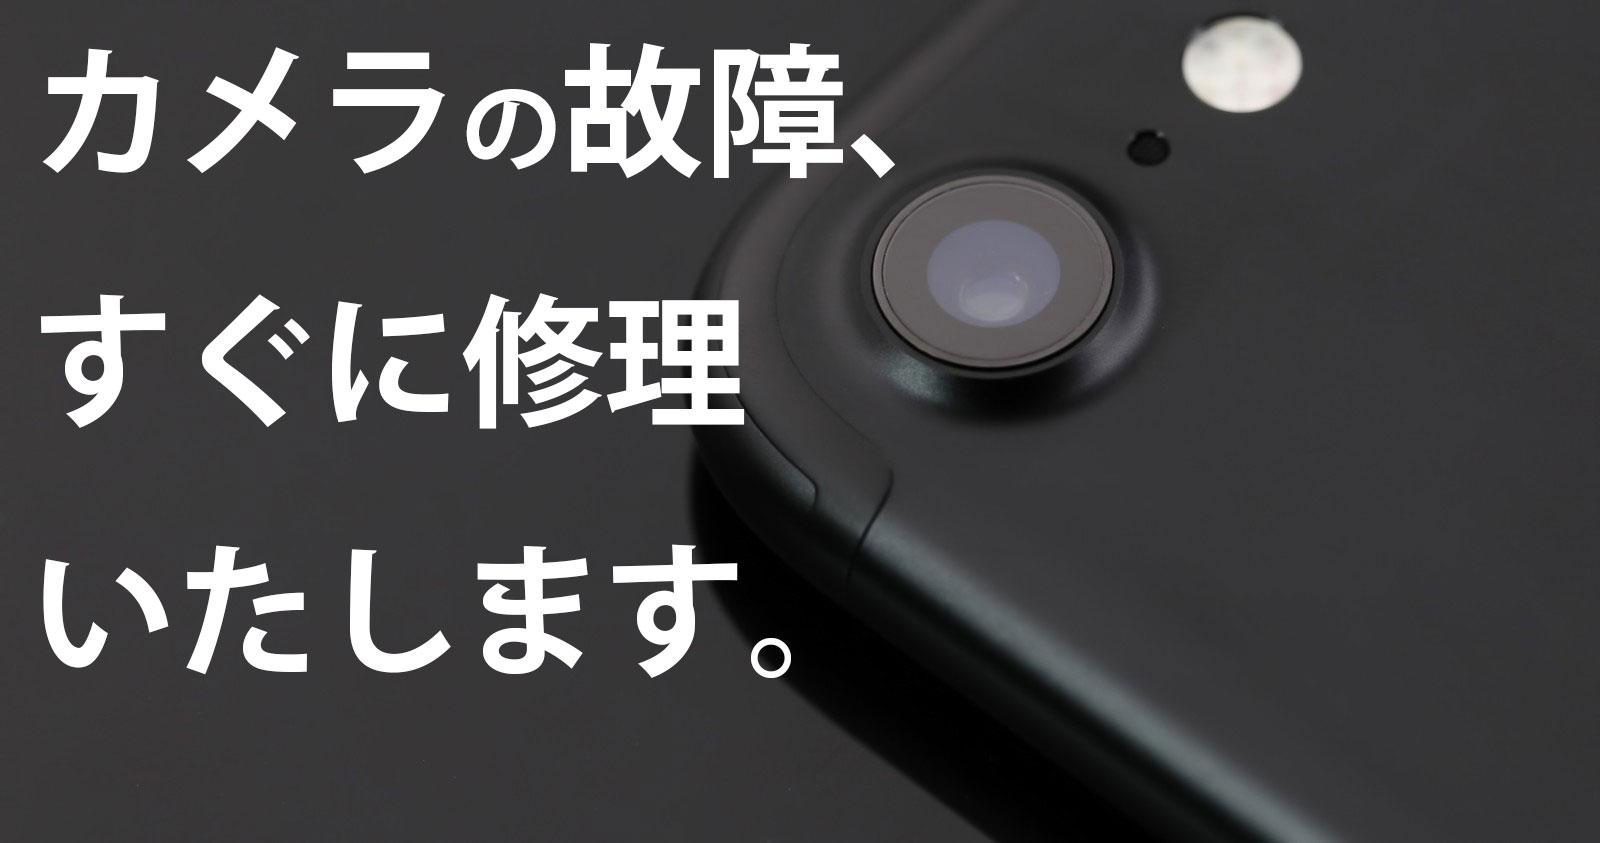 iPhoneカメラ故障・修理案内について